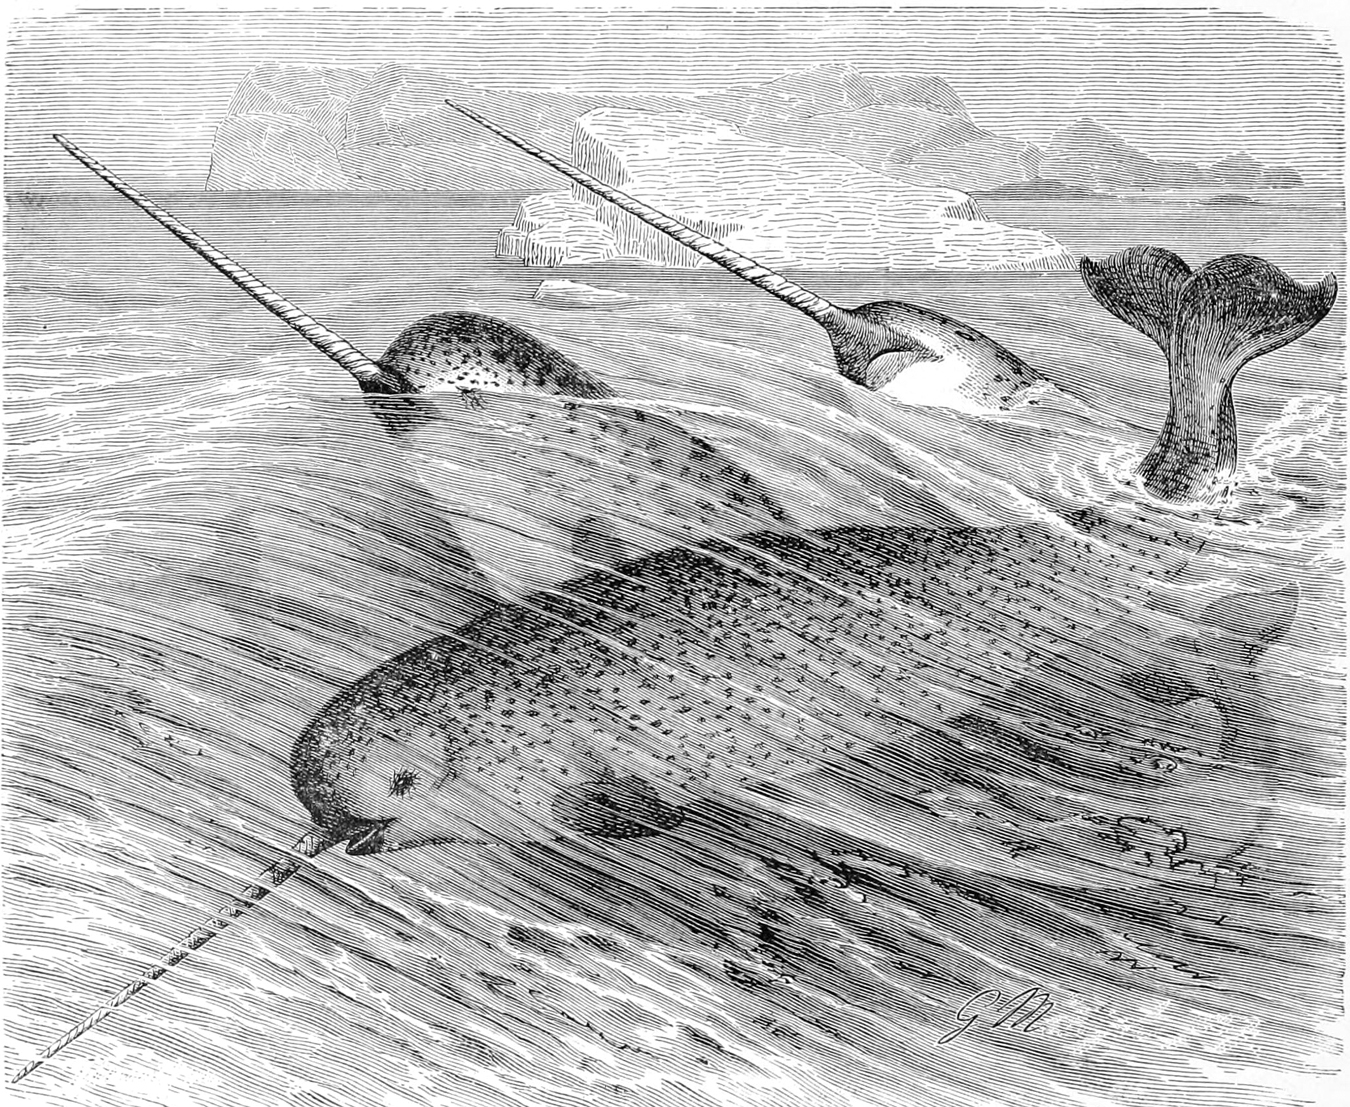 File:Monodon monoceros.jpg - Wikimedia Commons